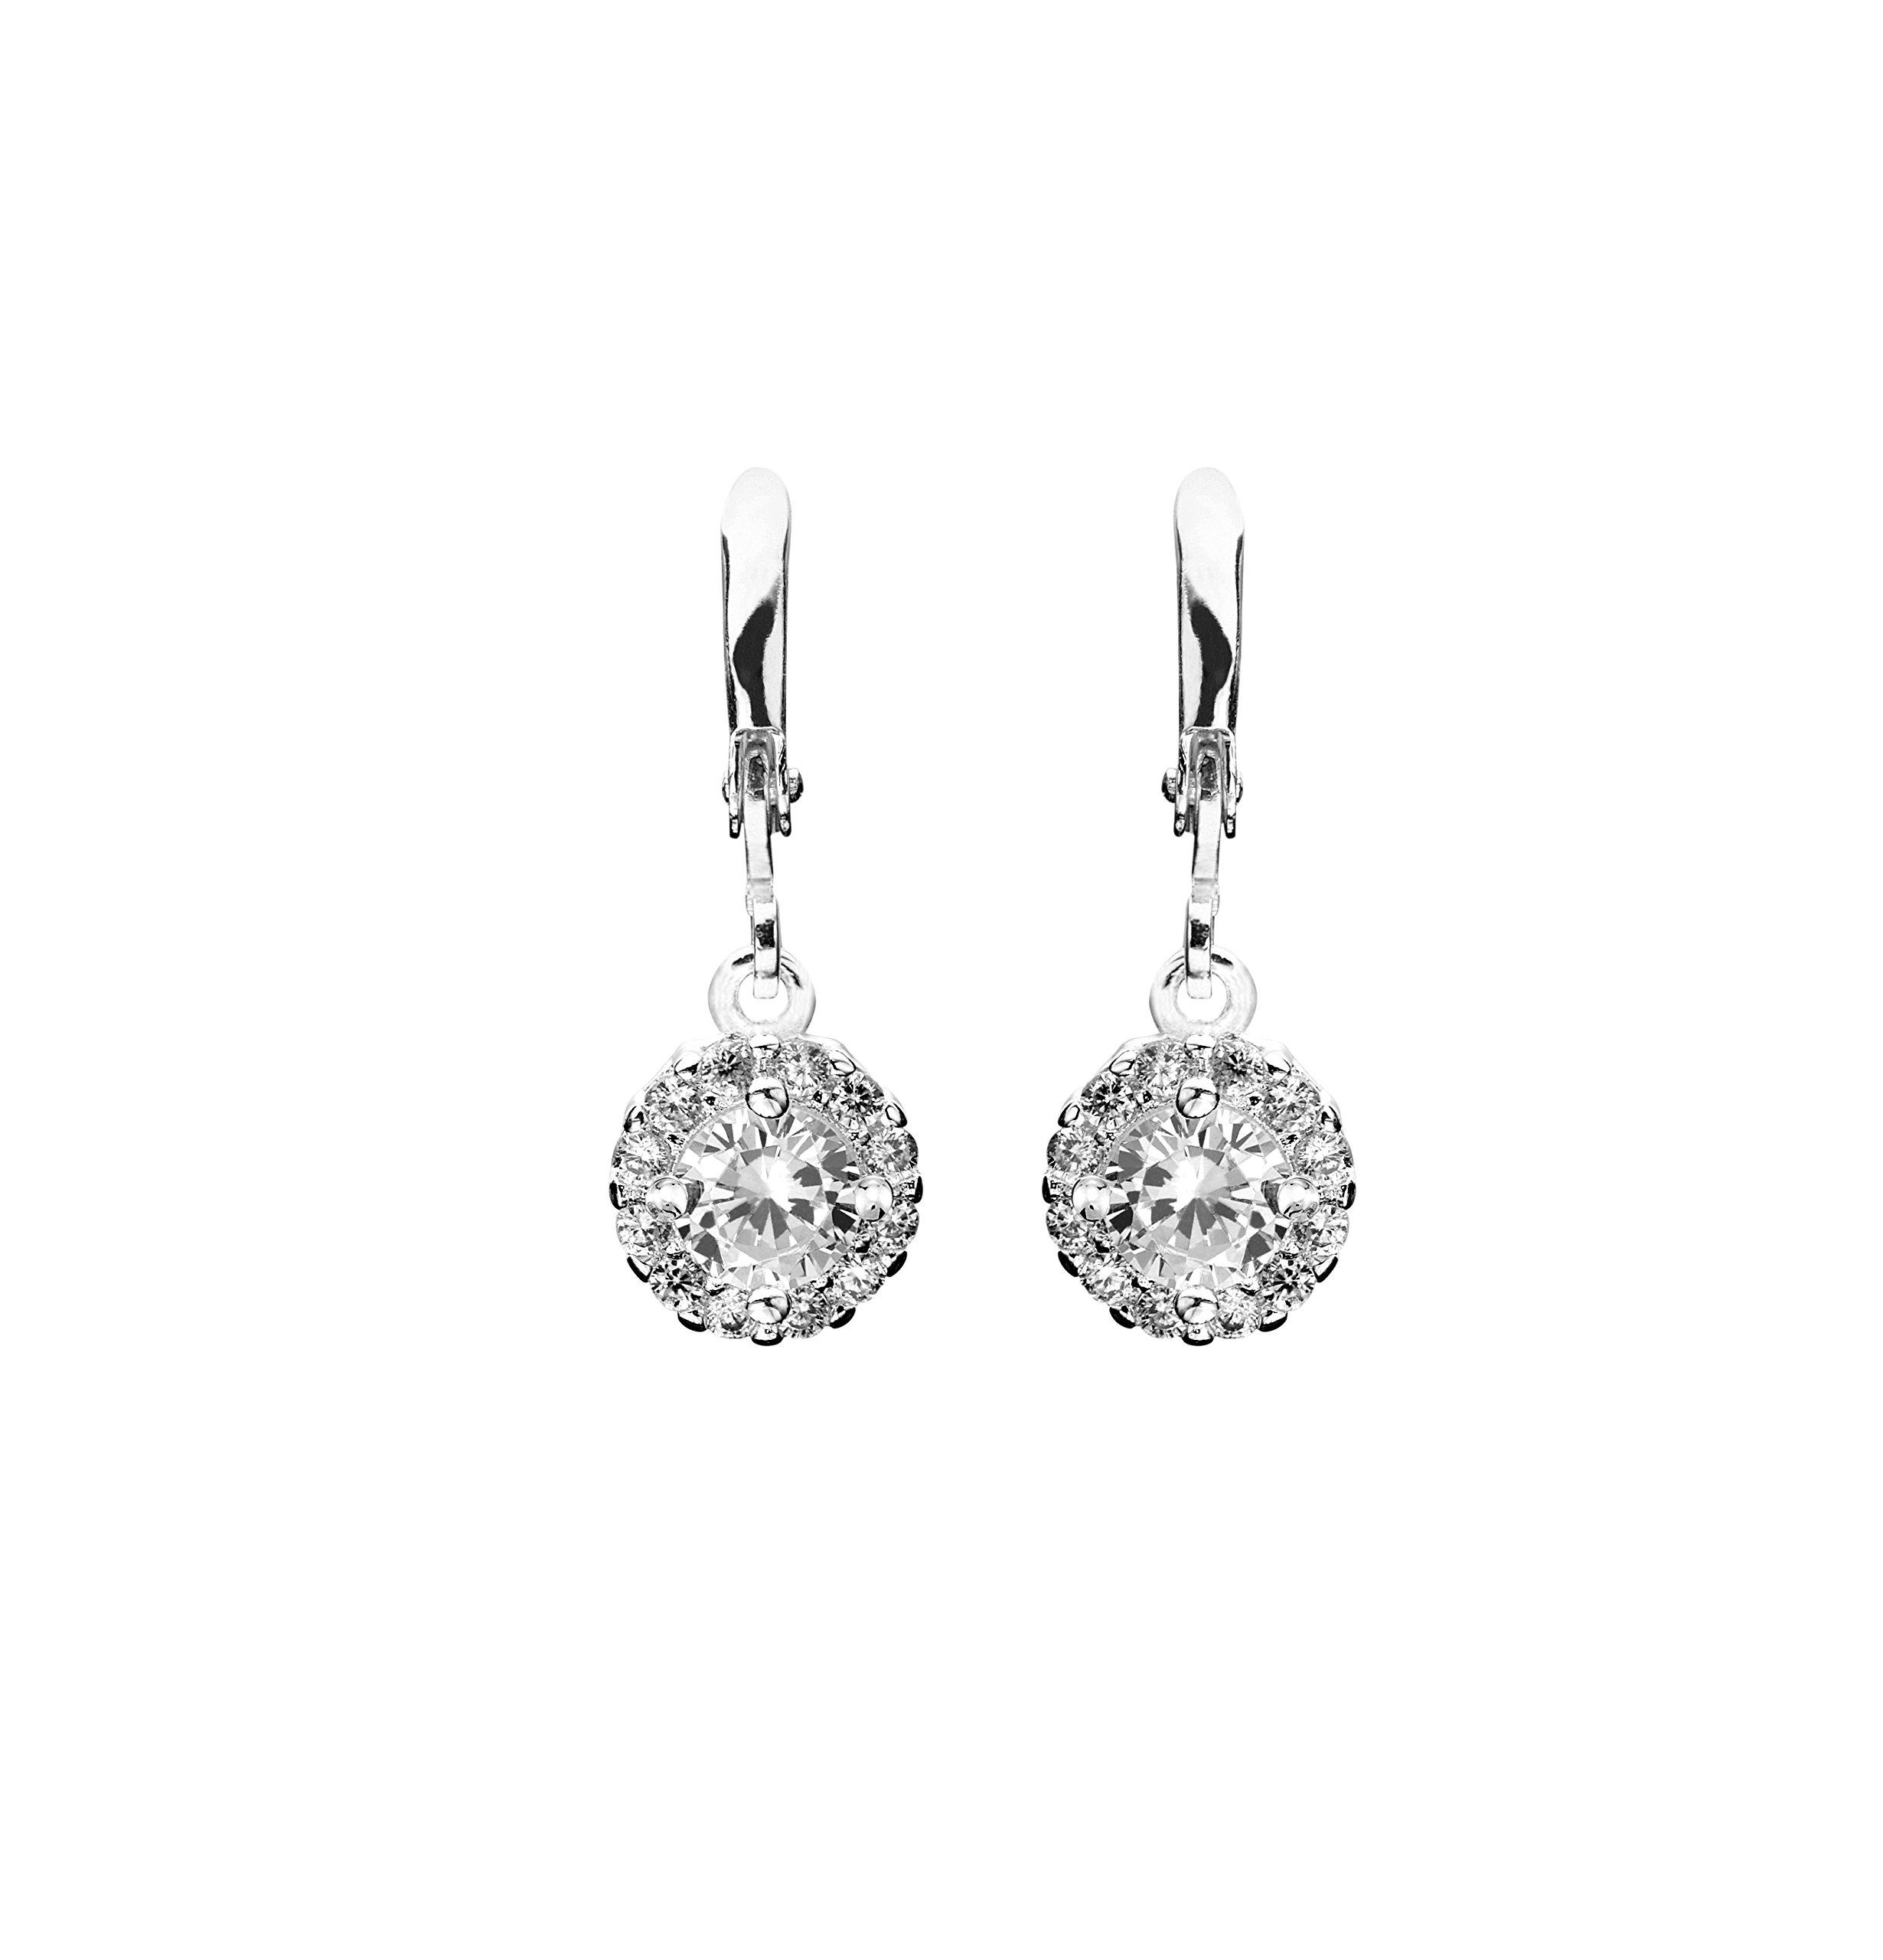 Ashlynn Avenue - Laurelai on a Summer Night, Silver-Plated, 4 Ct Earrings